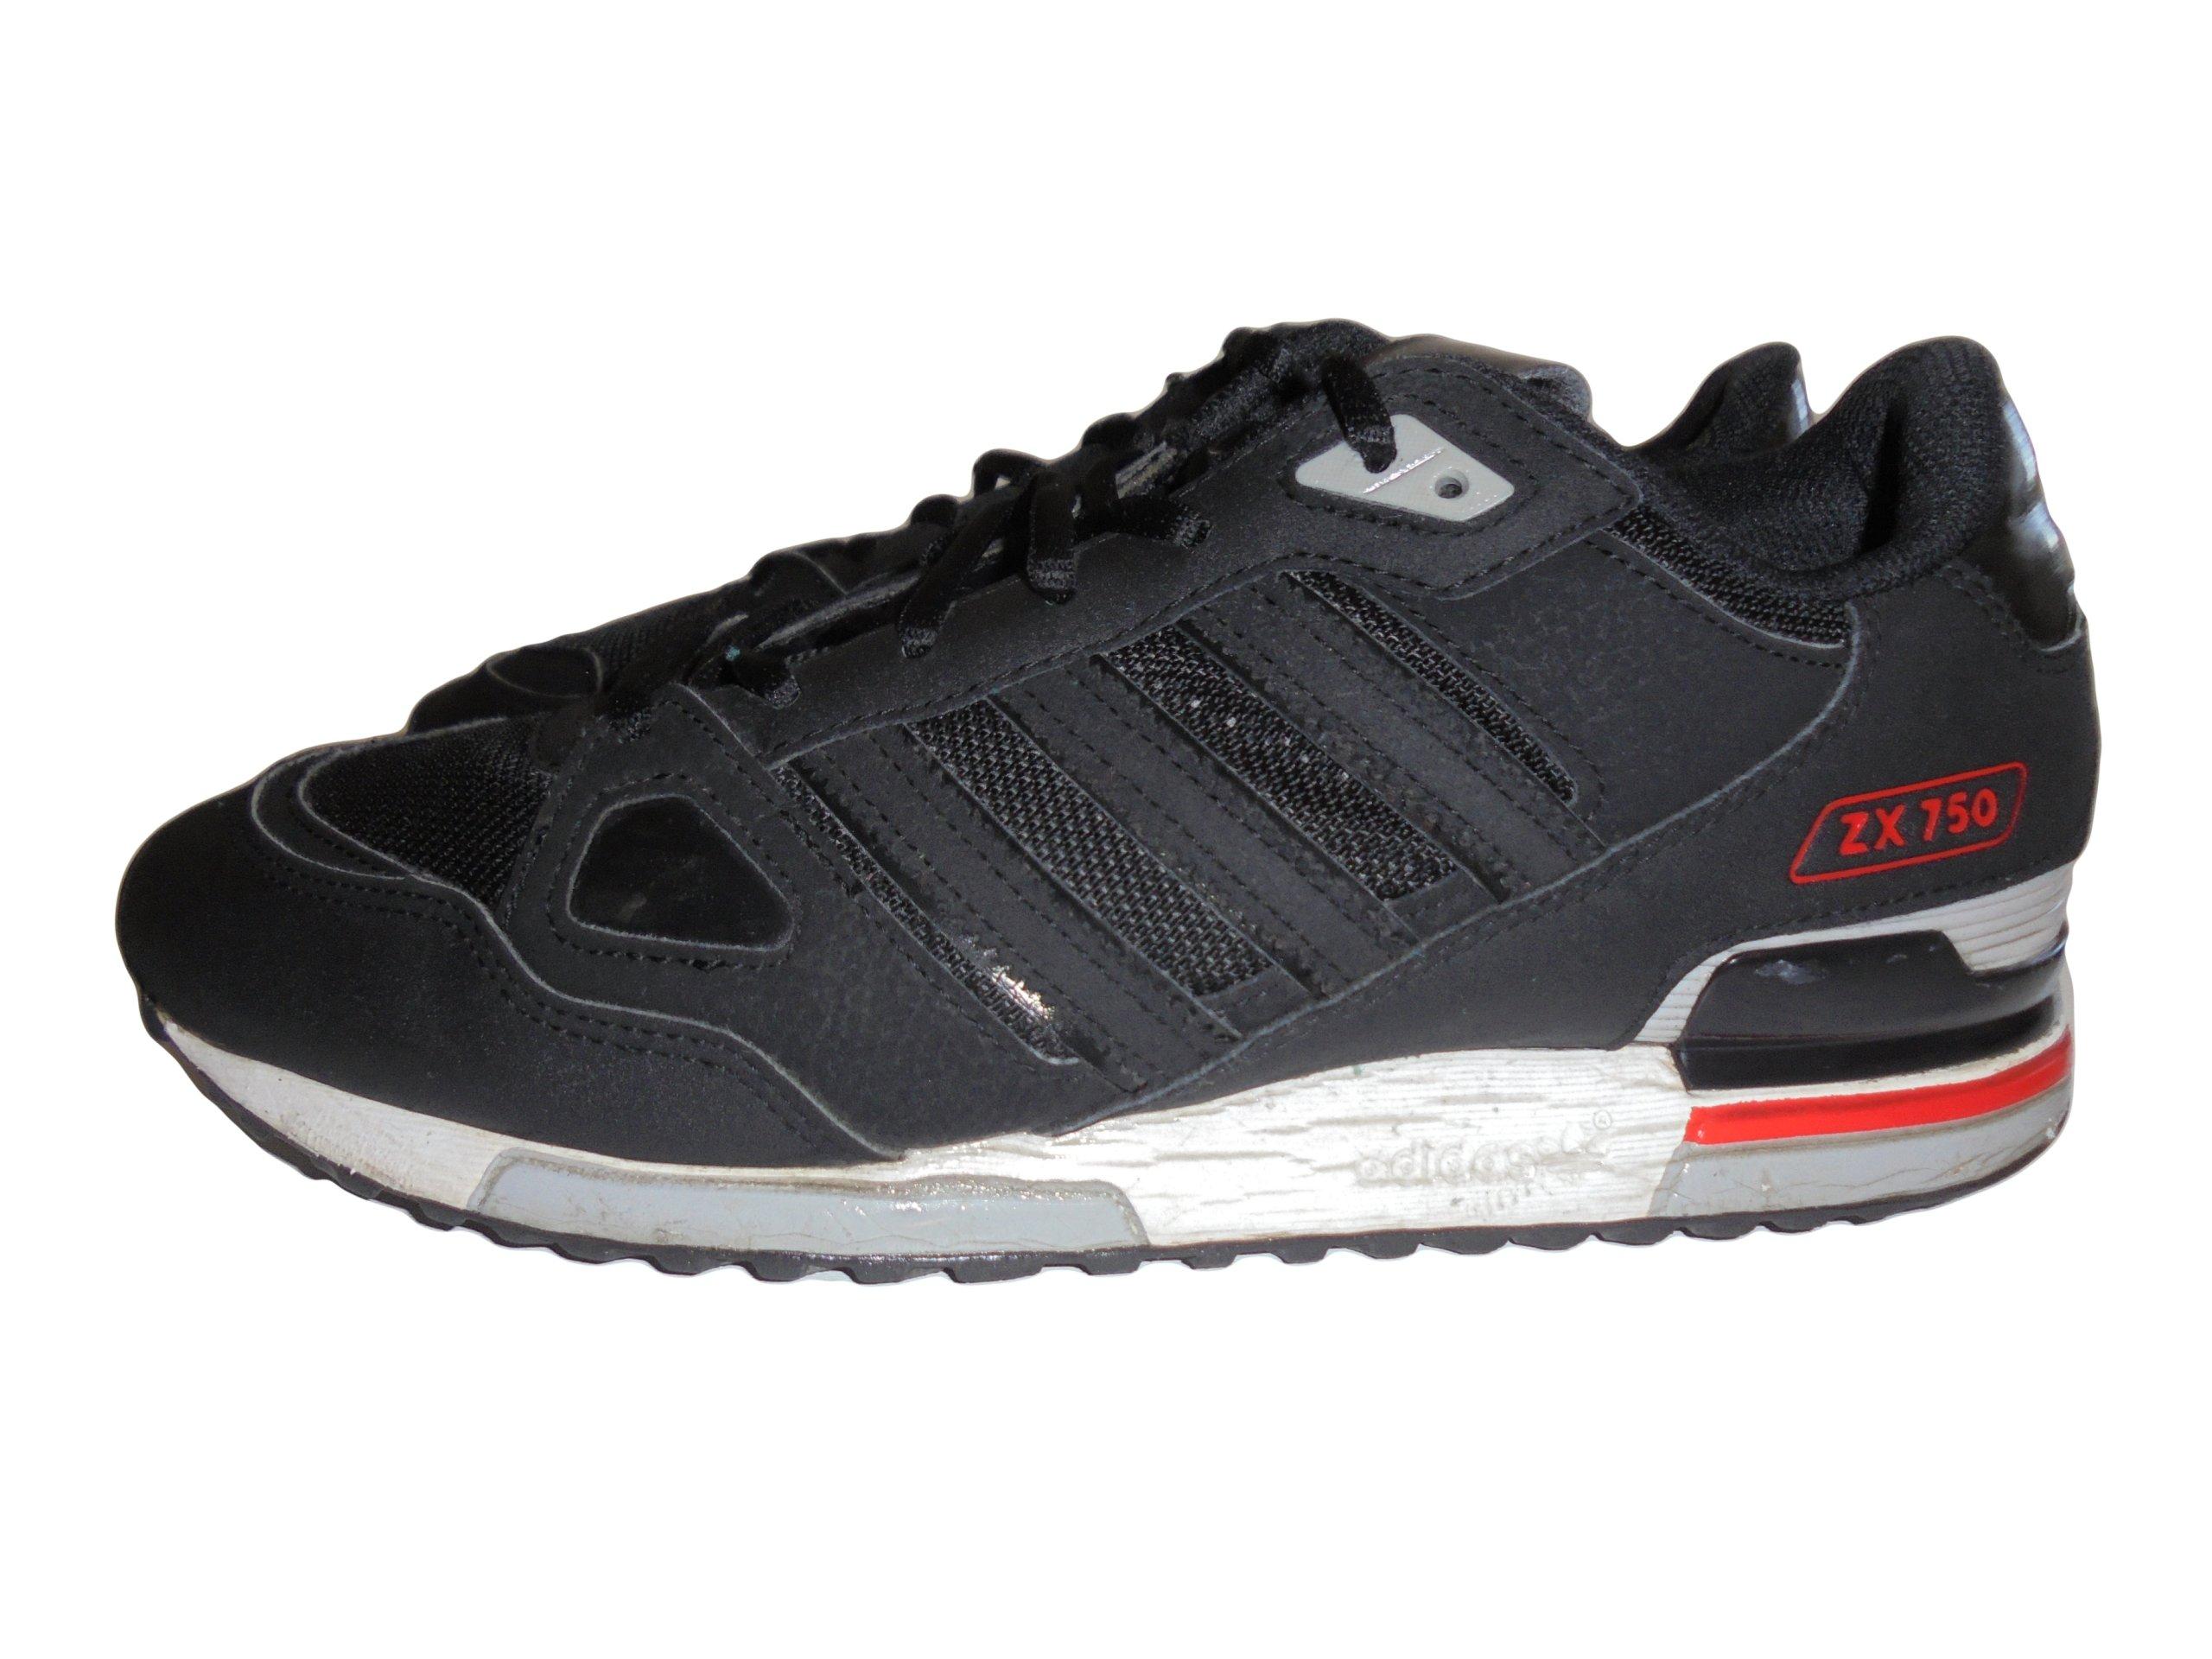 6f4adfbc53afe ... coupon code buty firmy adidas zx 750. rozmiar 42. 759a2 29920